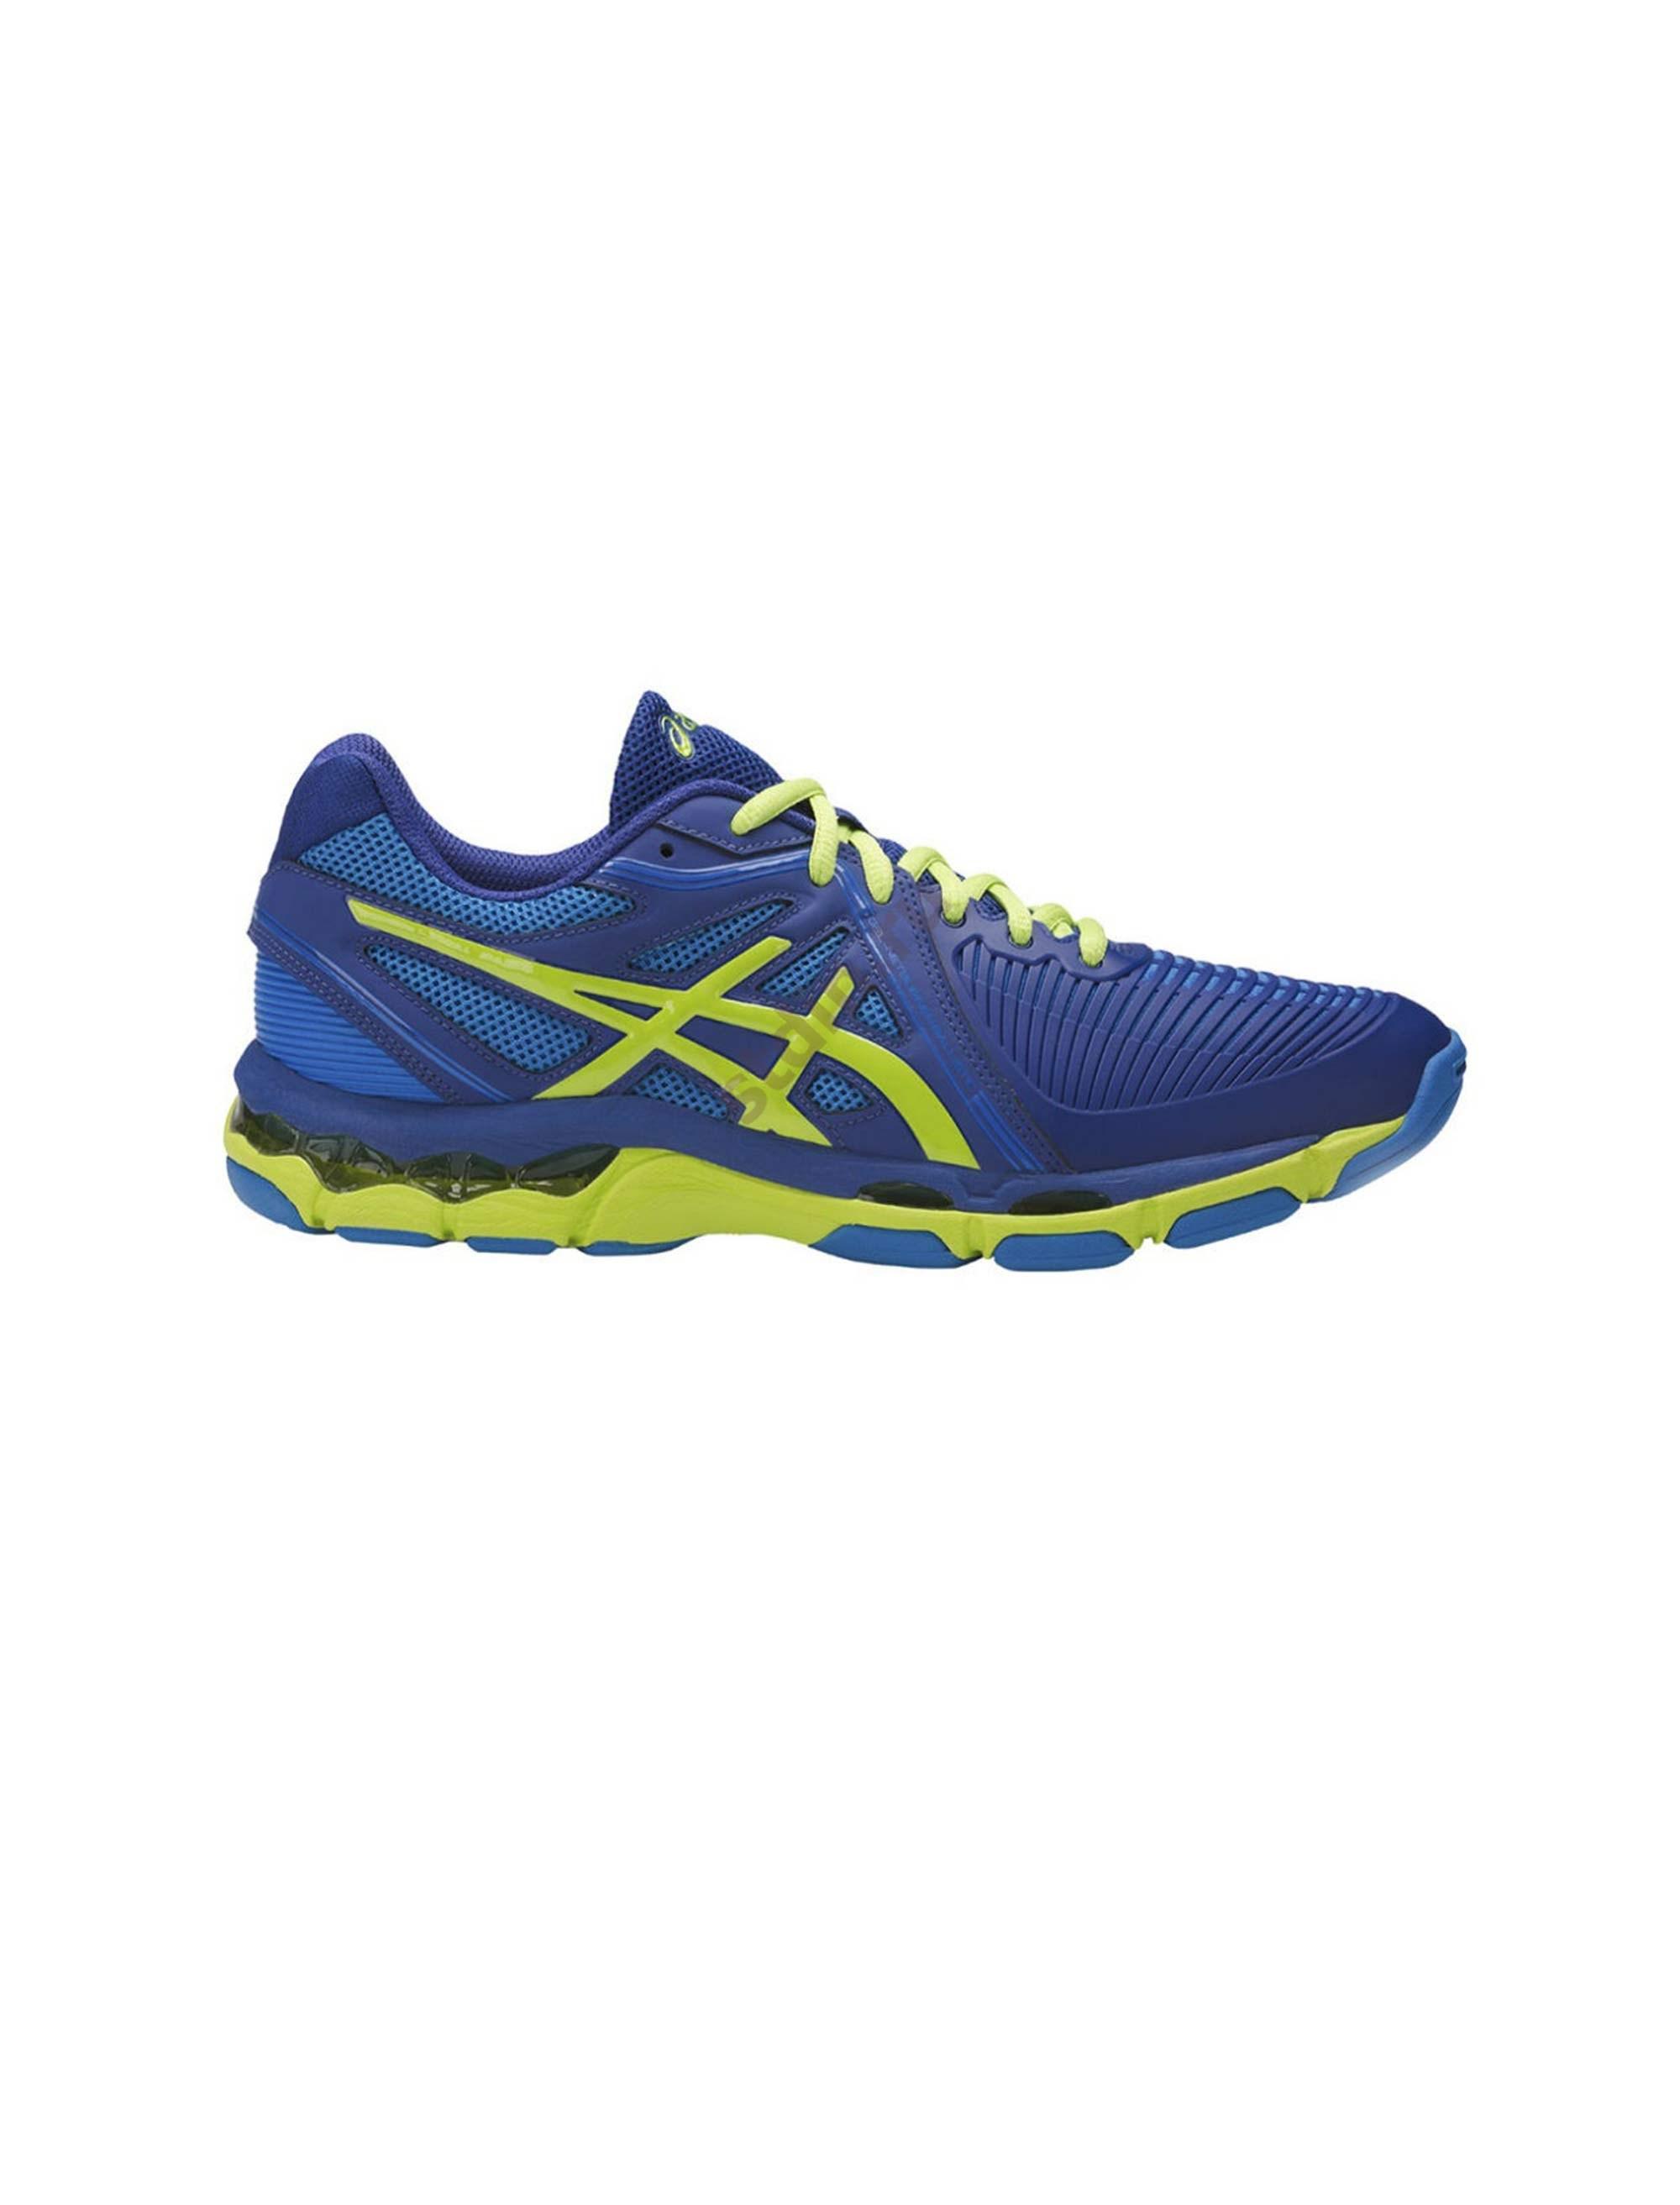 کفش والیبال بندی مردانه GLNTBRNRBLLSTC